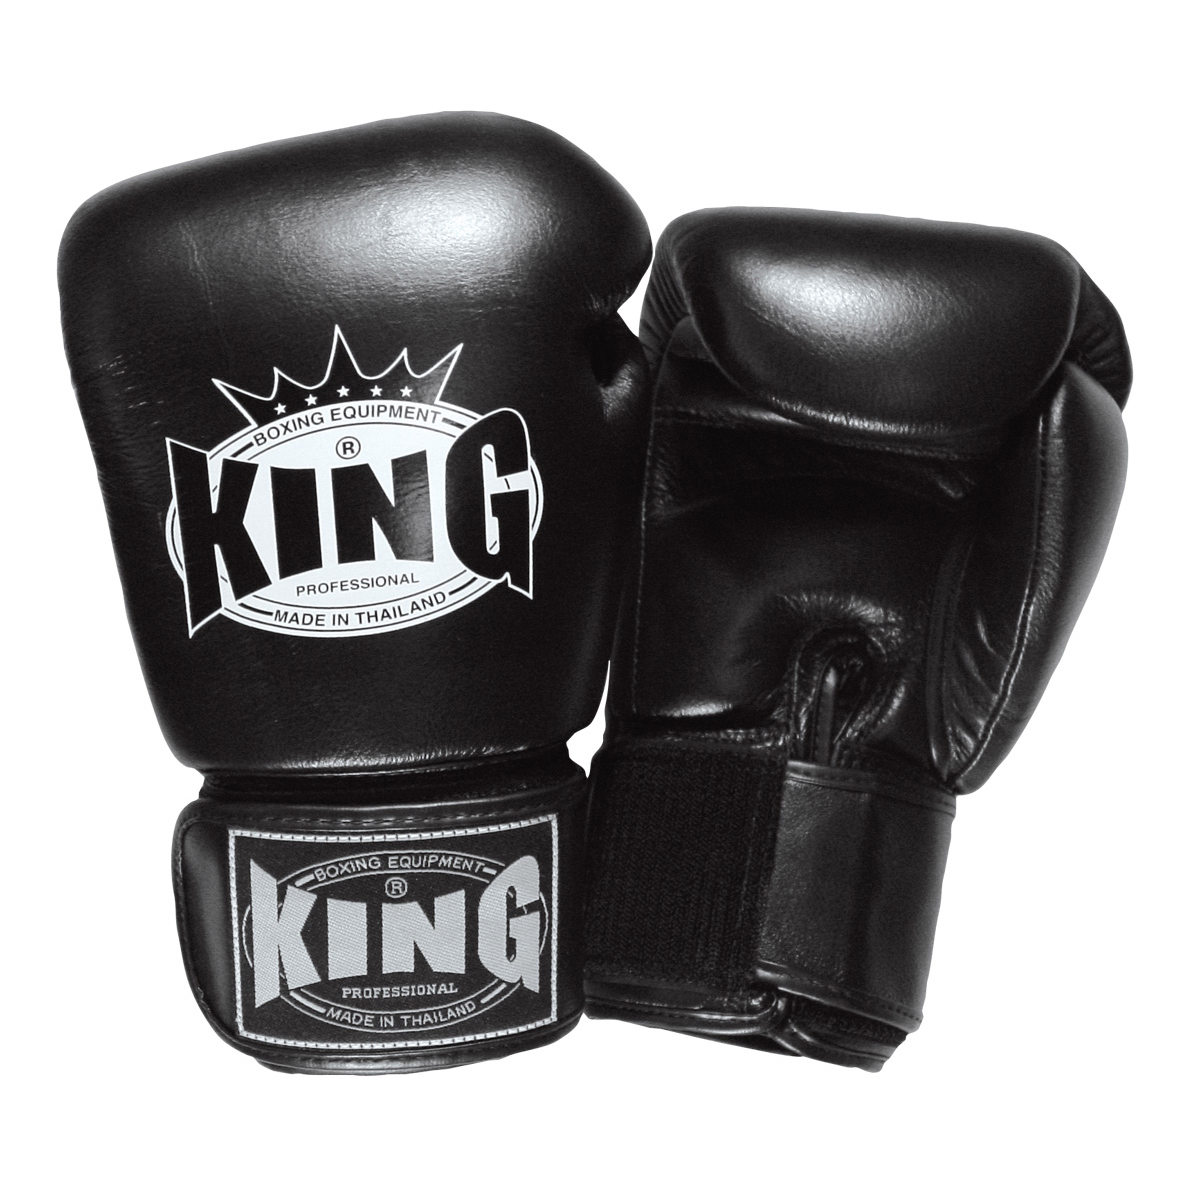 Black gloves at target - Black Gloves At Target 1